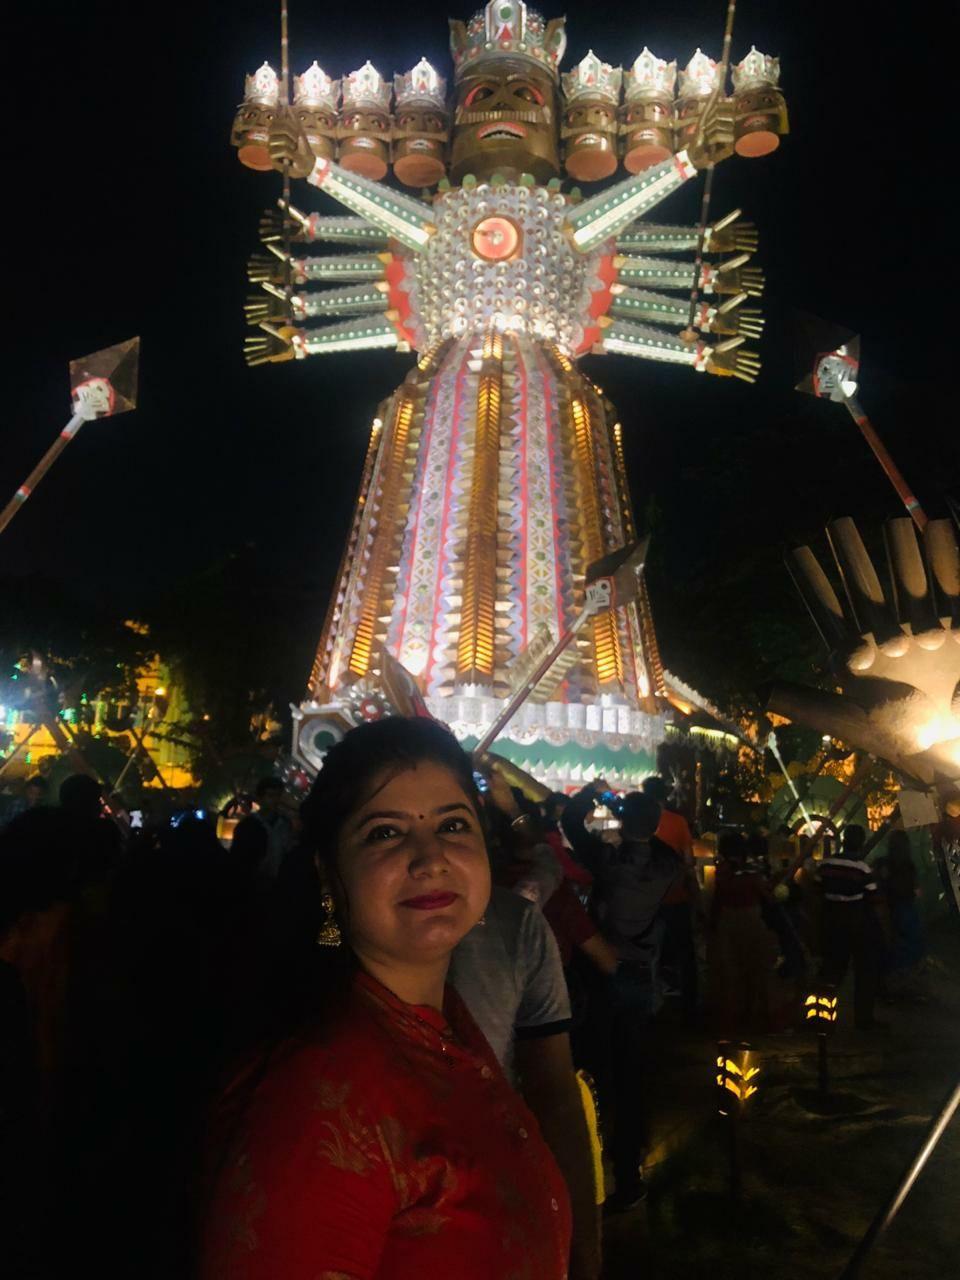 Photo of Kolkata By Shriti_shri